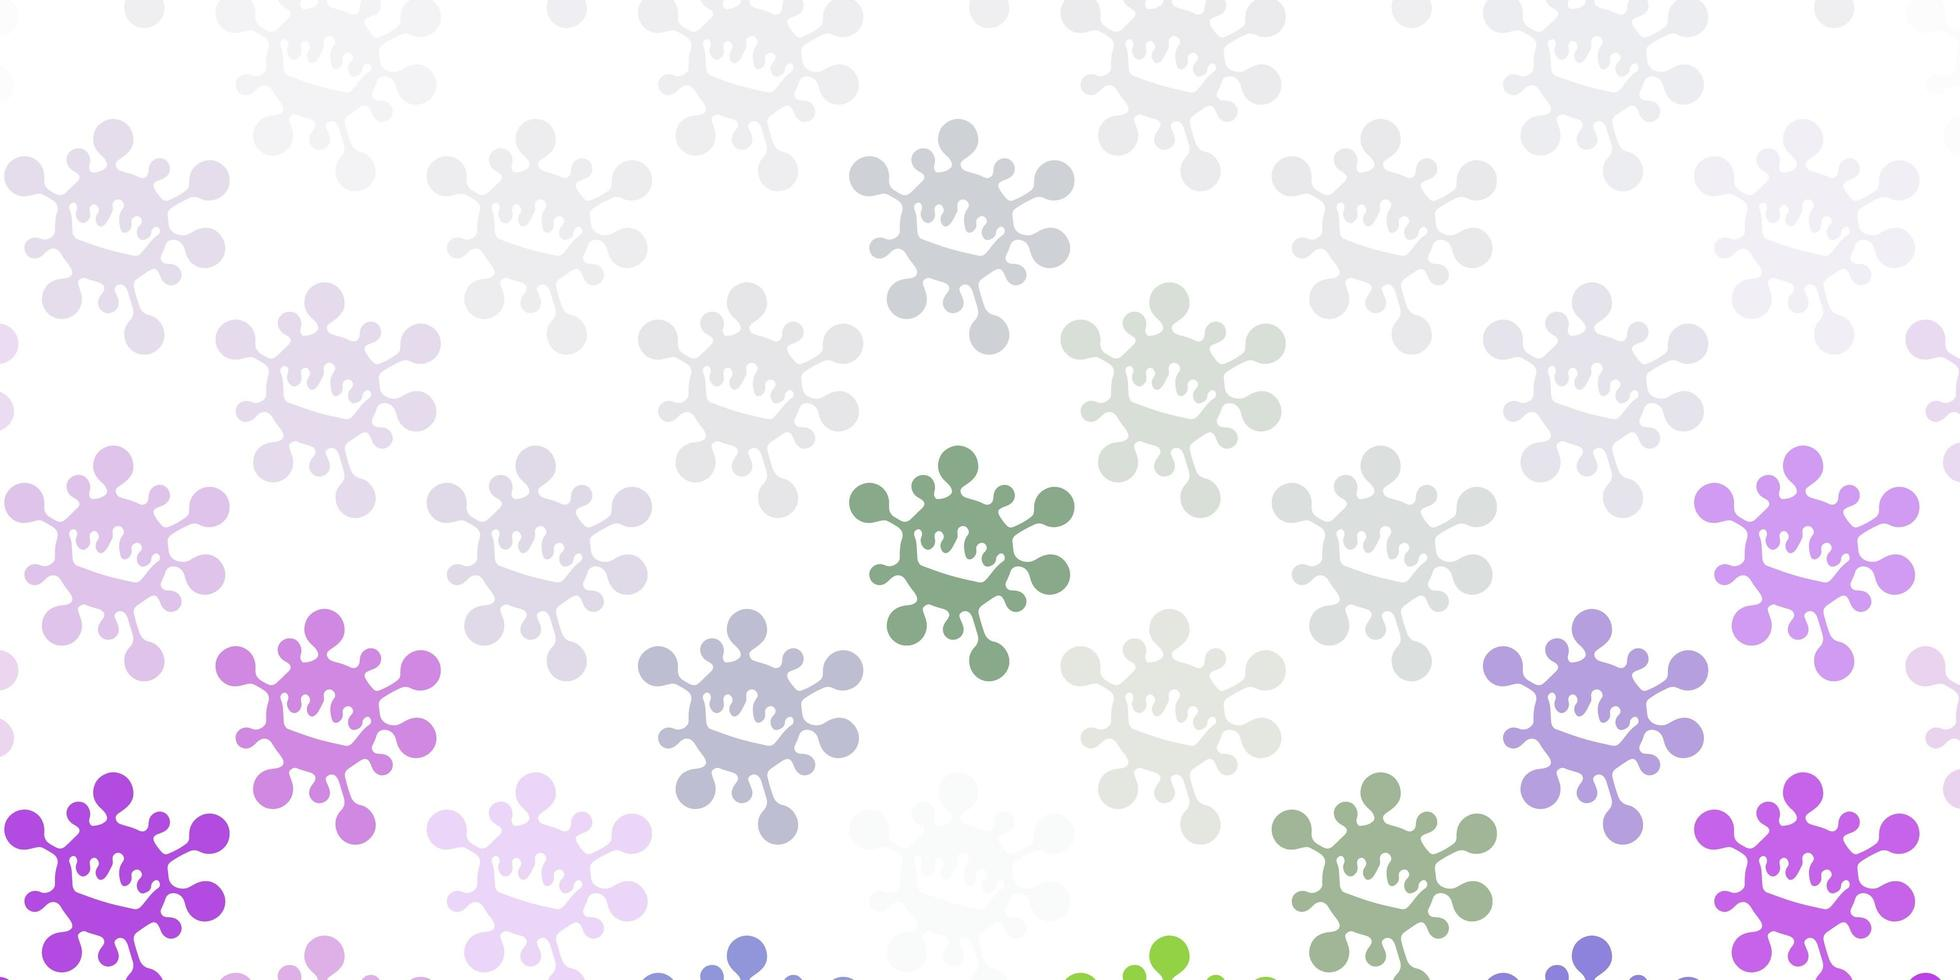 Light pink, green vector backdrop with virus symbols